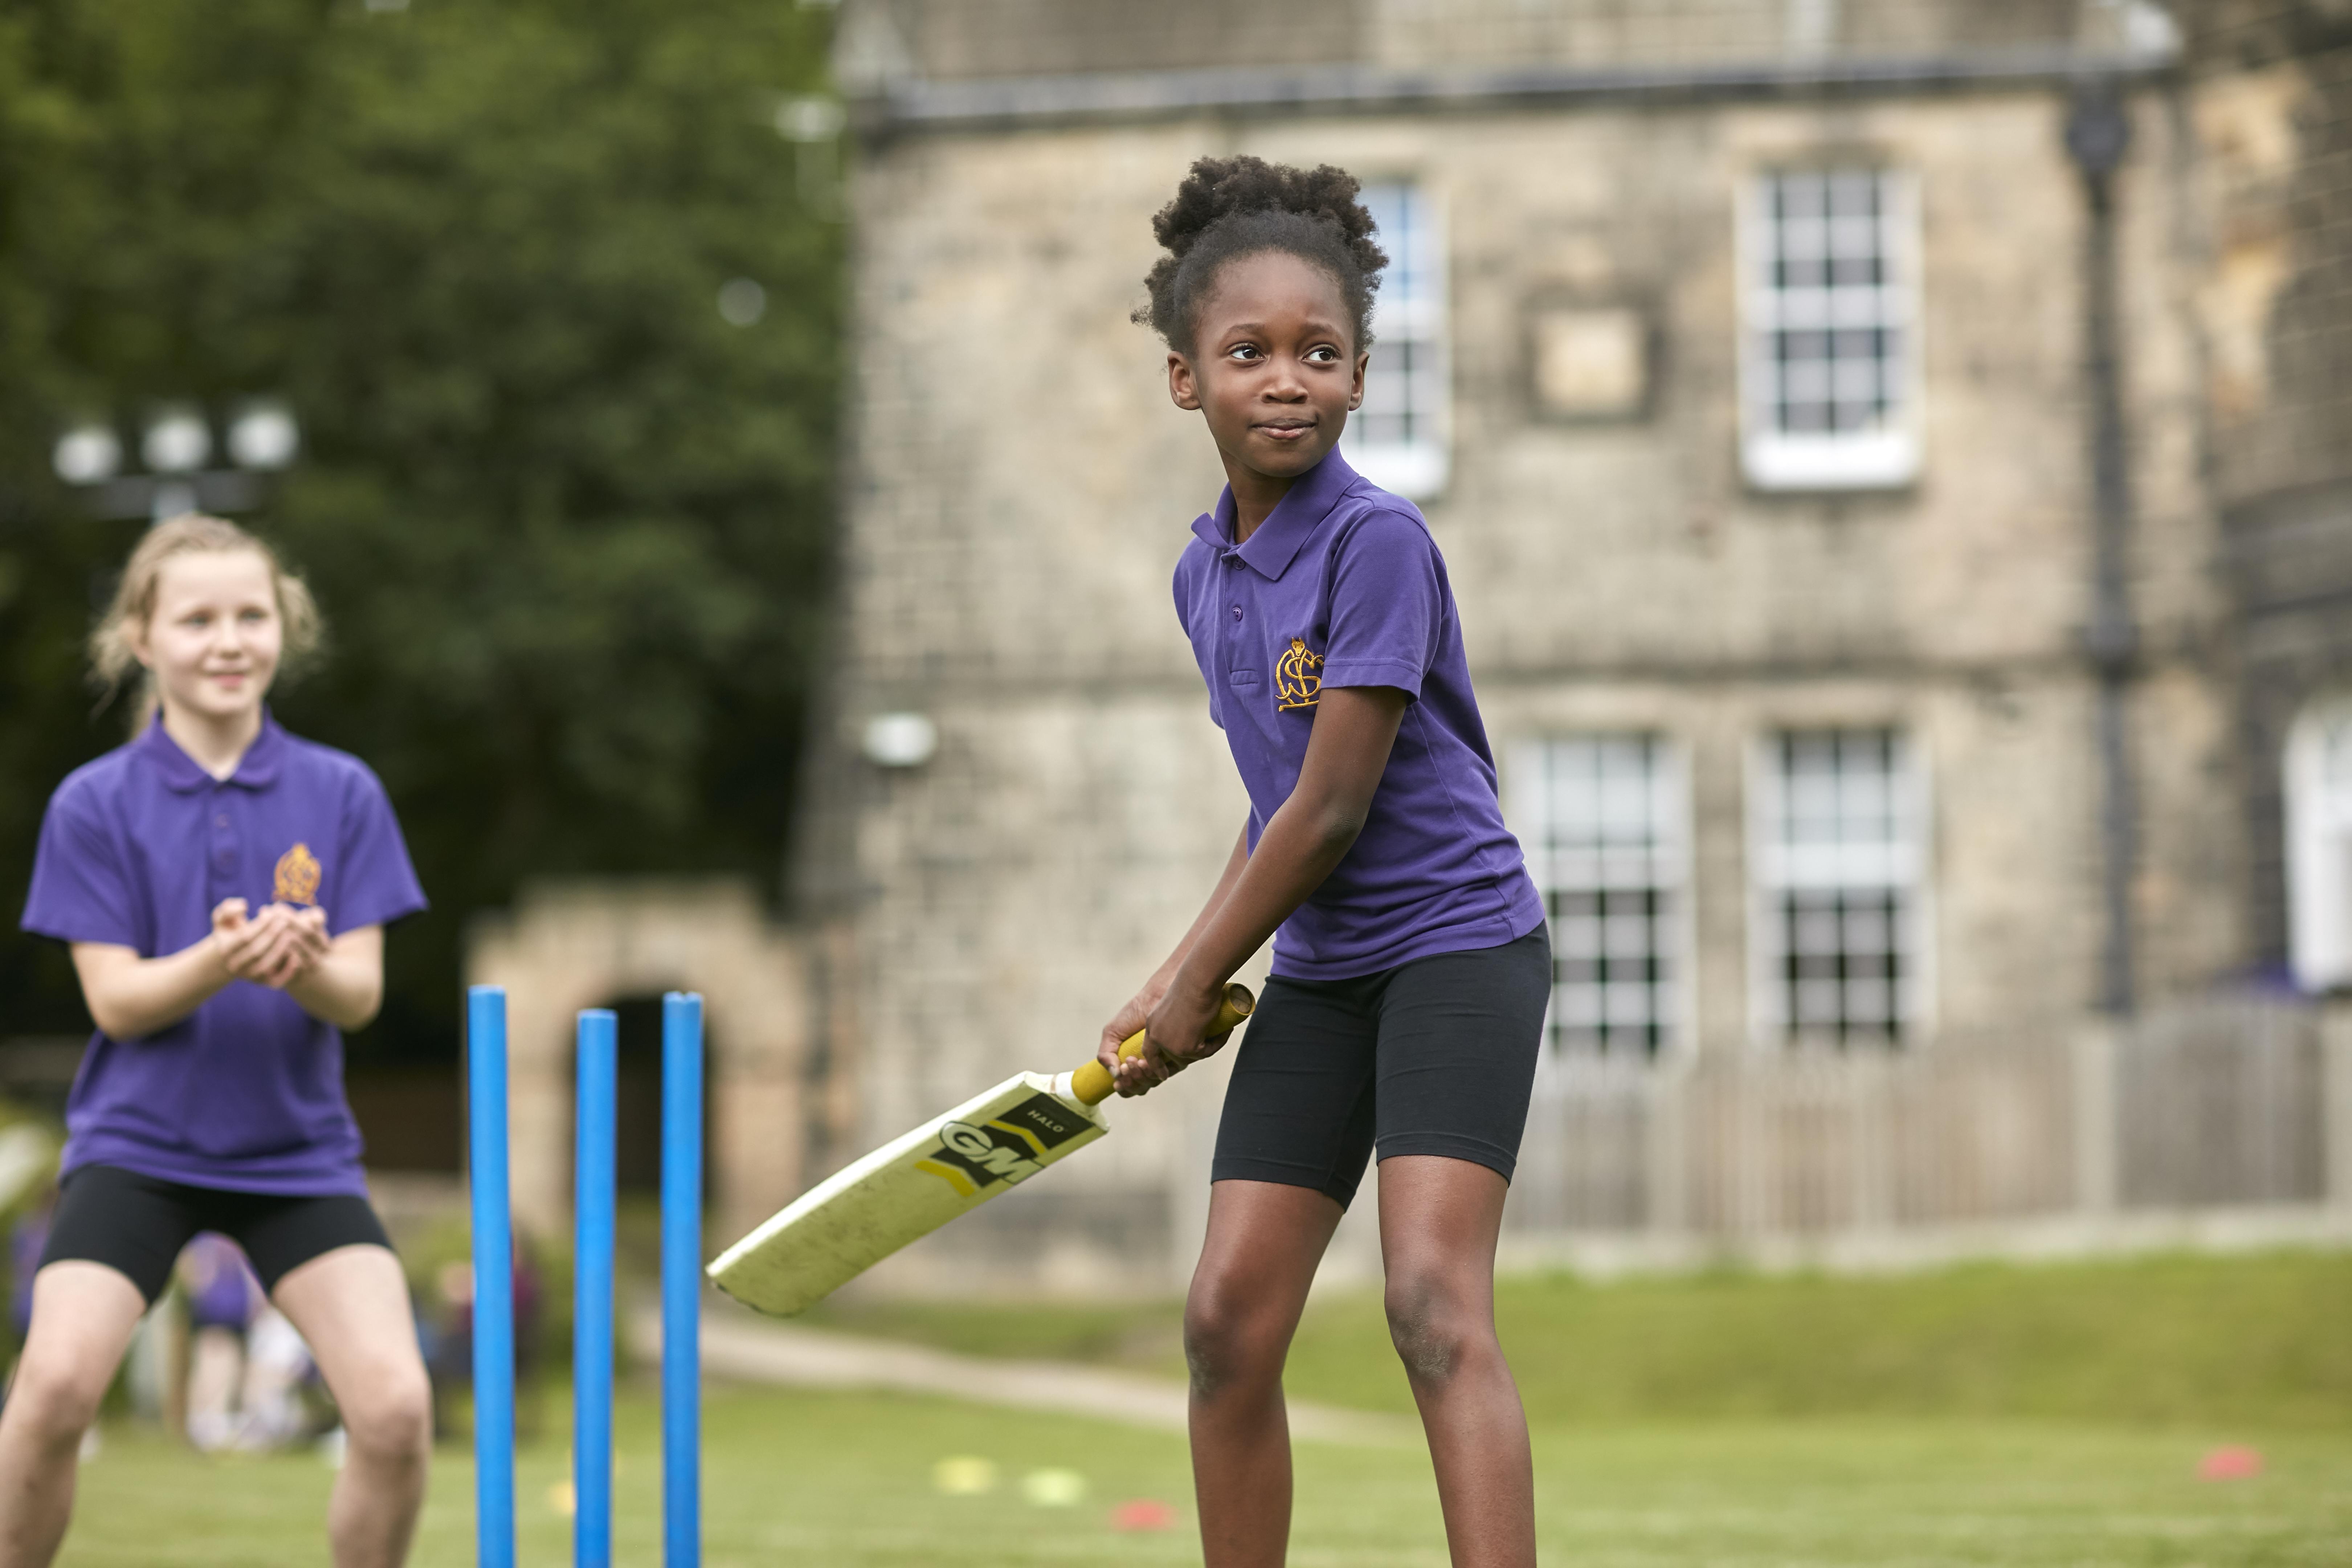 Sport is key at Moorlands